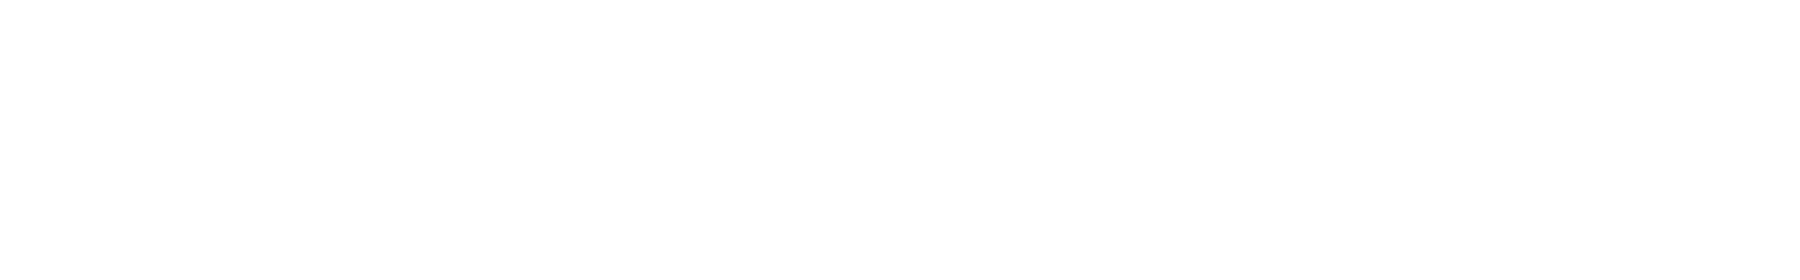 synth choir c7